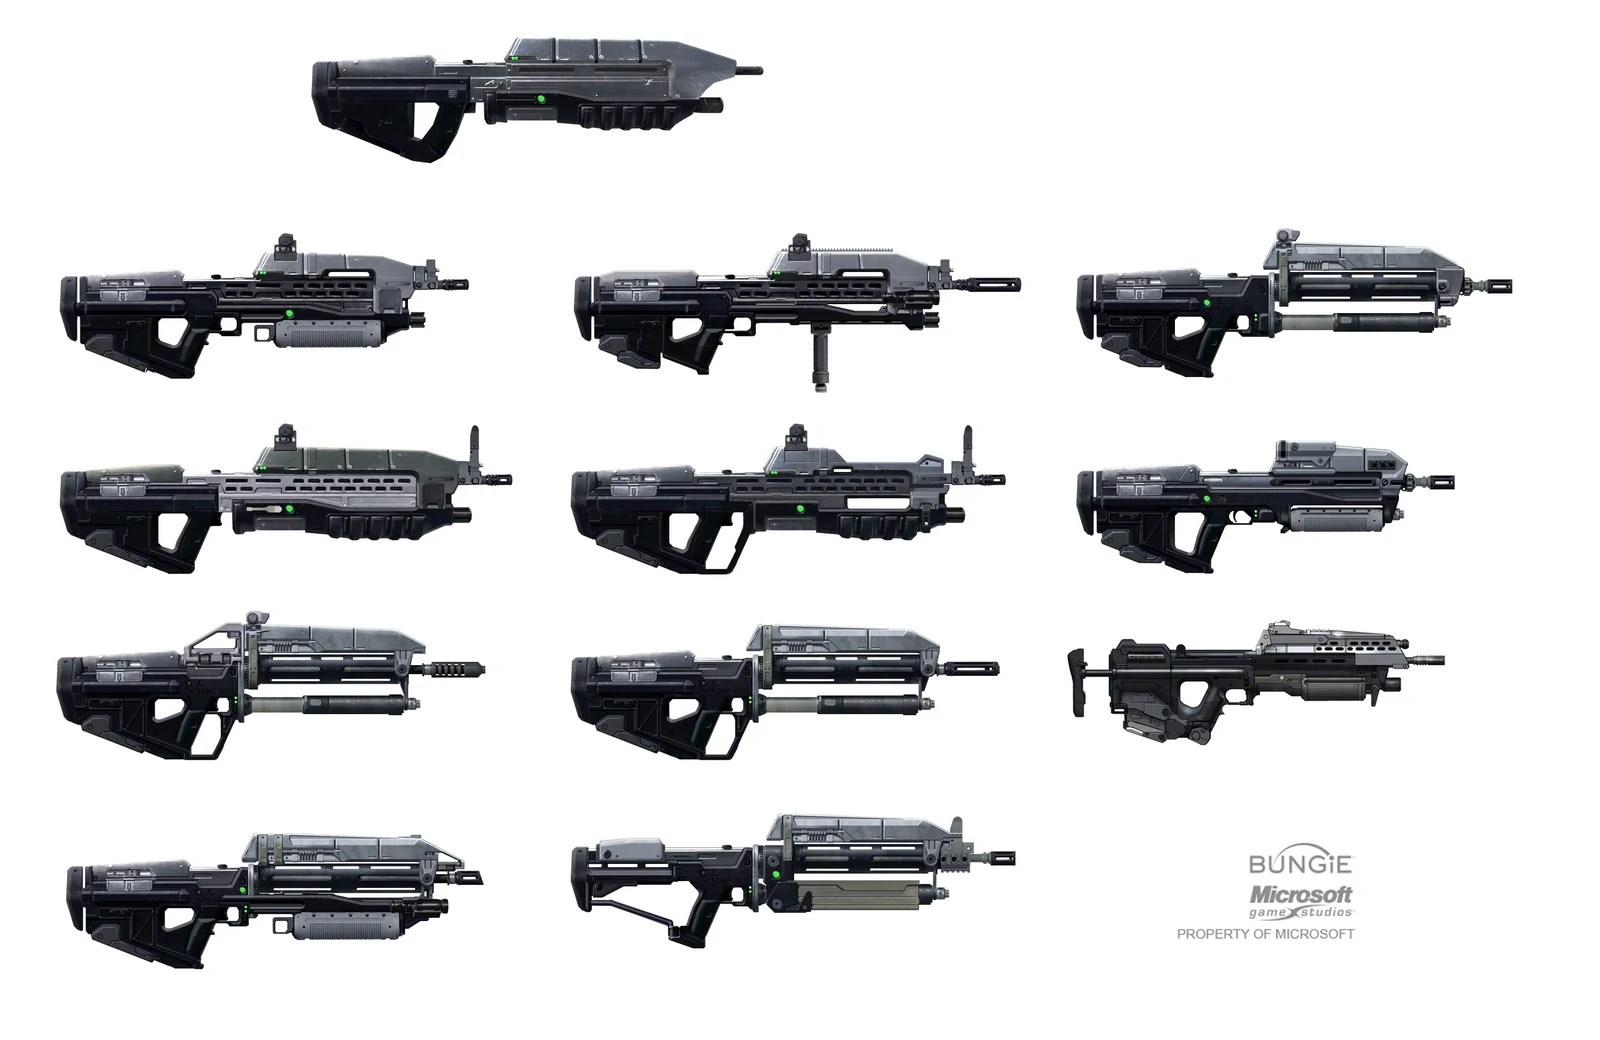 Various Looks For Loadout Guns